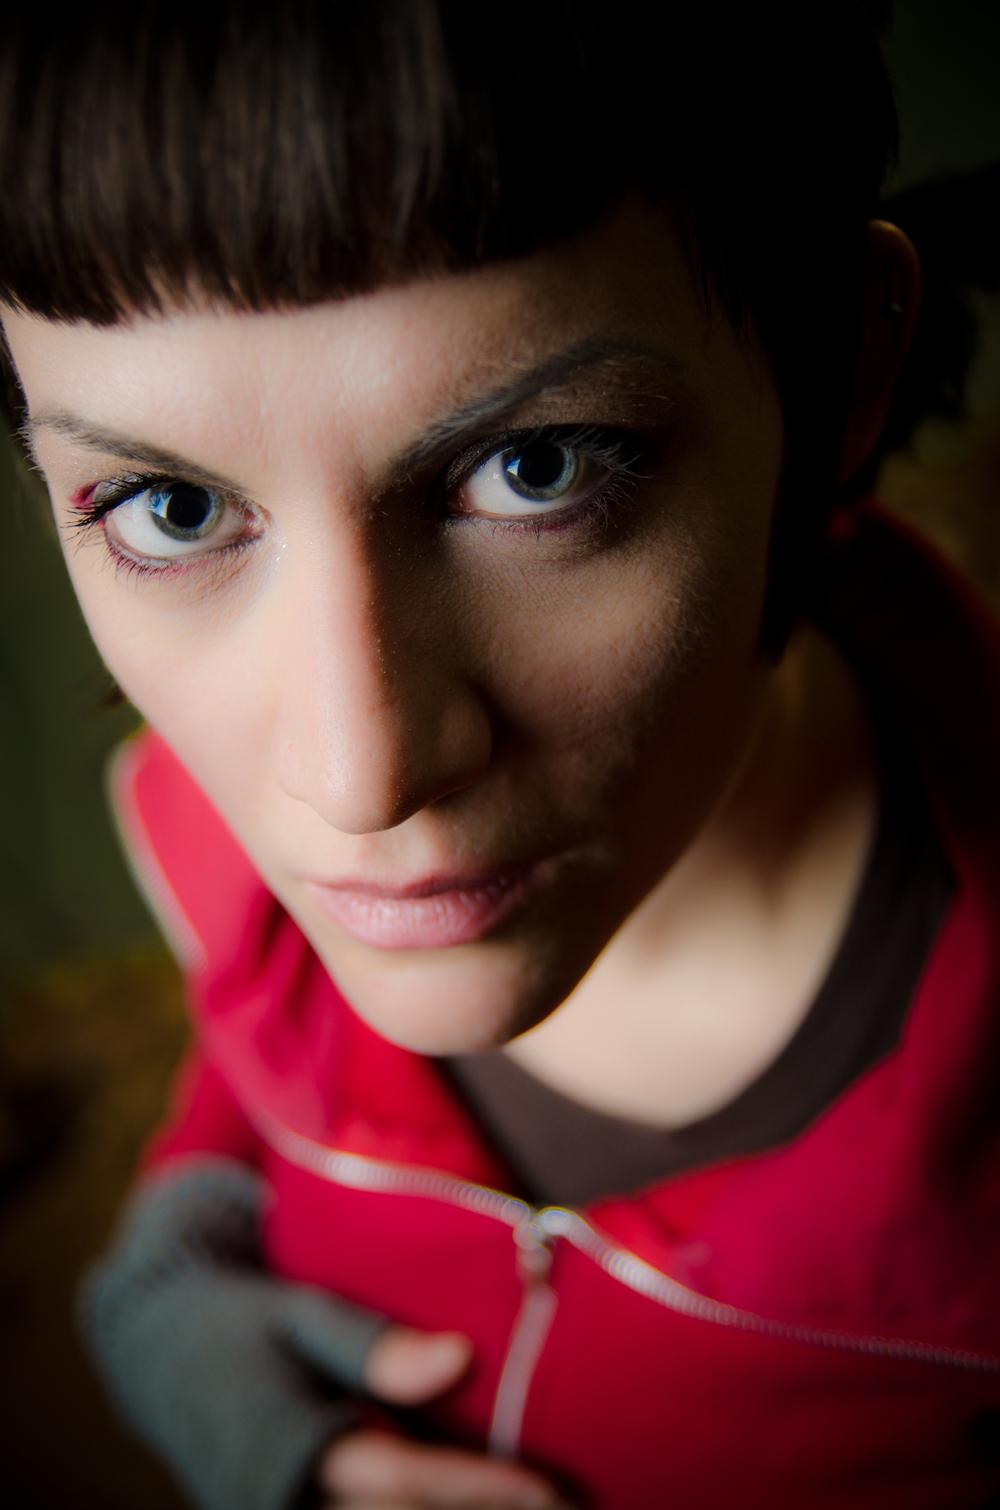 Portrait-Fine-Art-Photography-Jay-Lansford-002.jpg